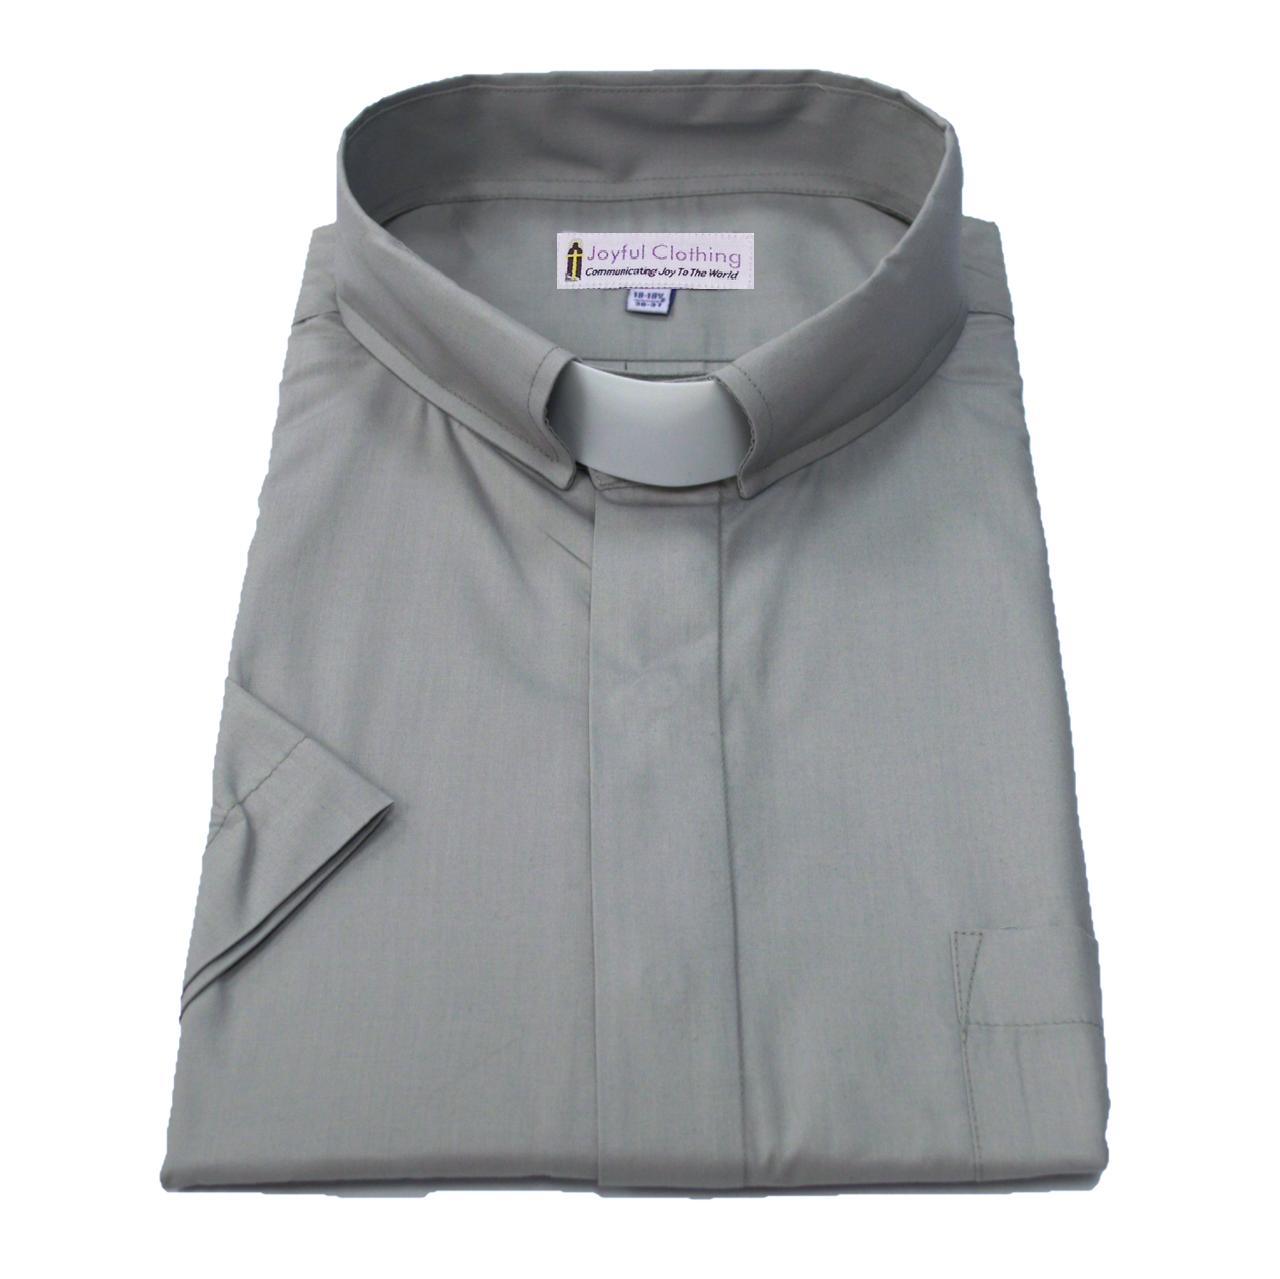 561. Women's Short-Sleeve Tab-Collar Clergy Shirt - Gray